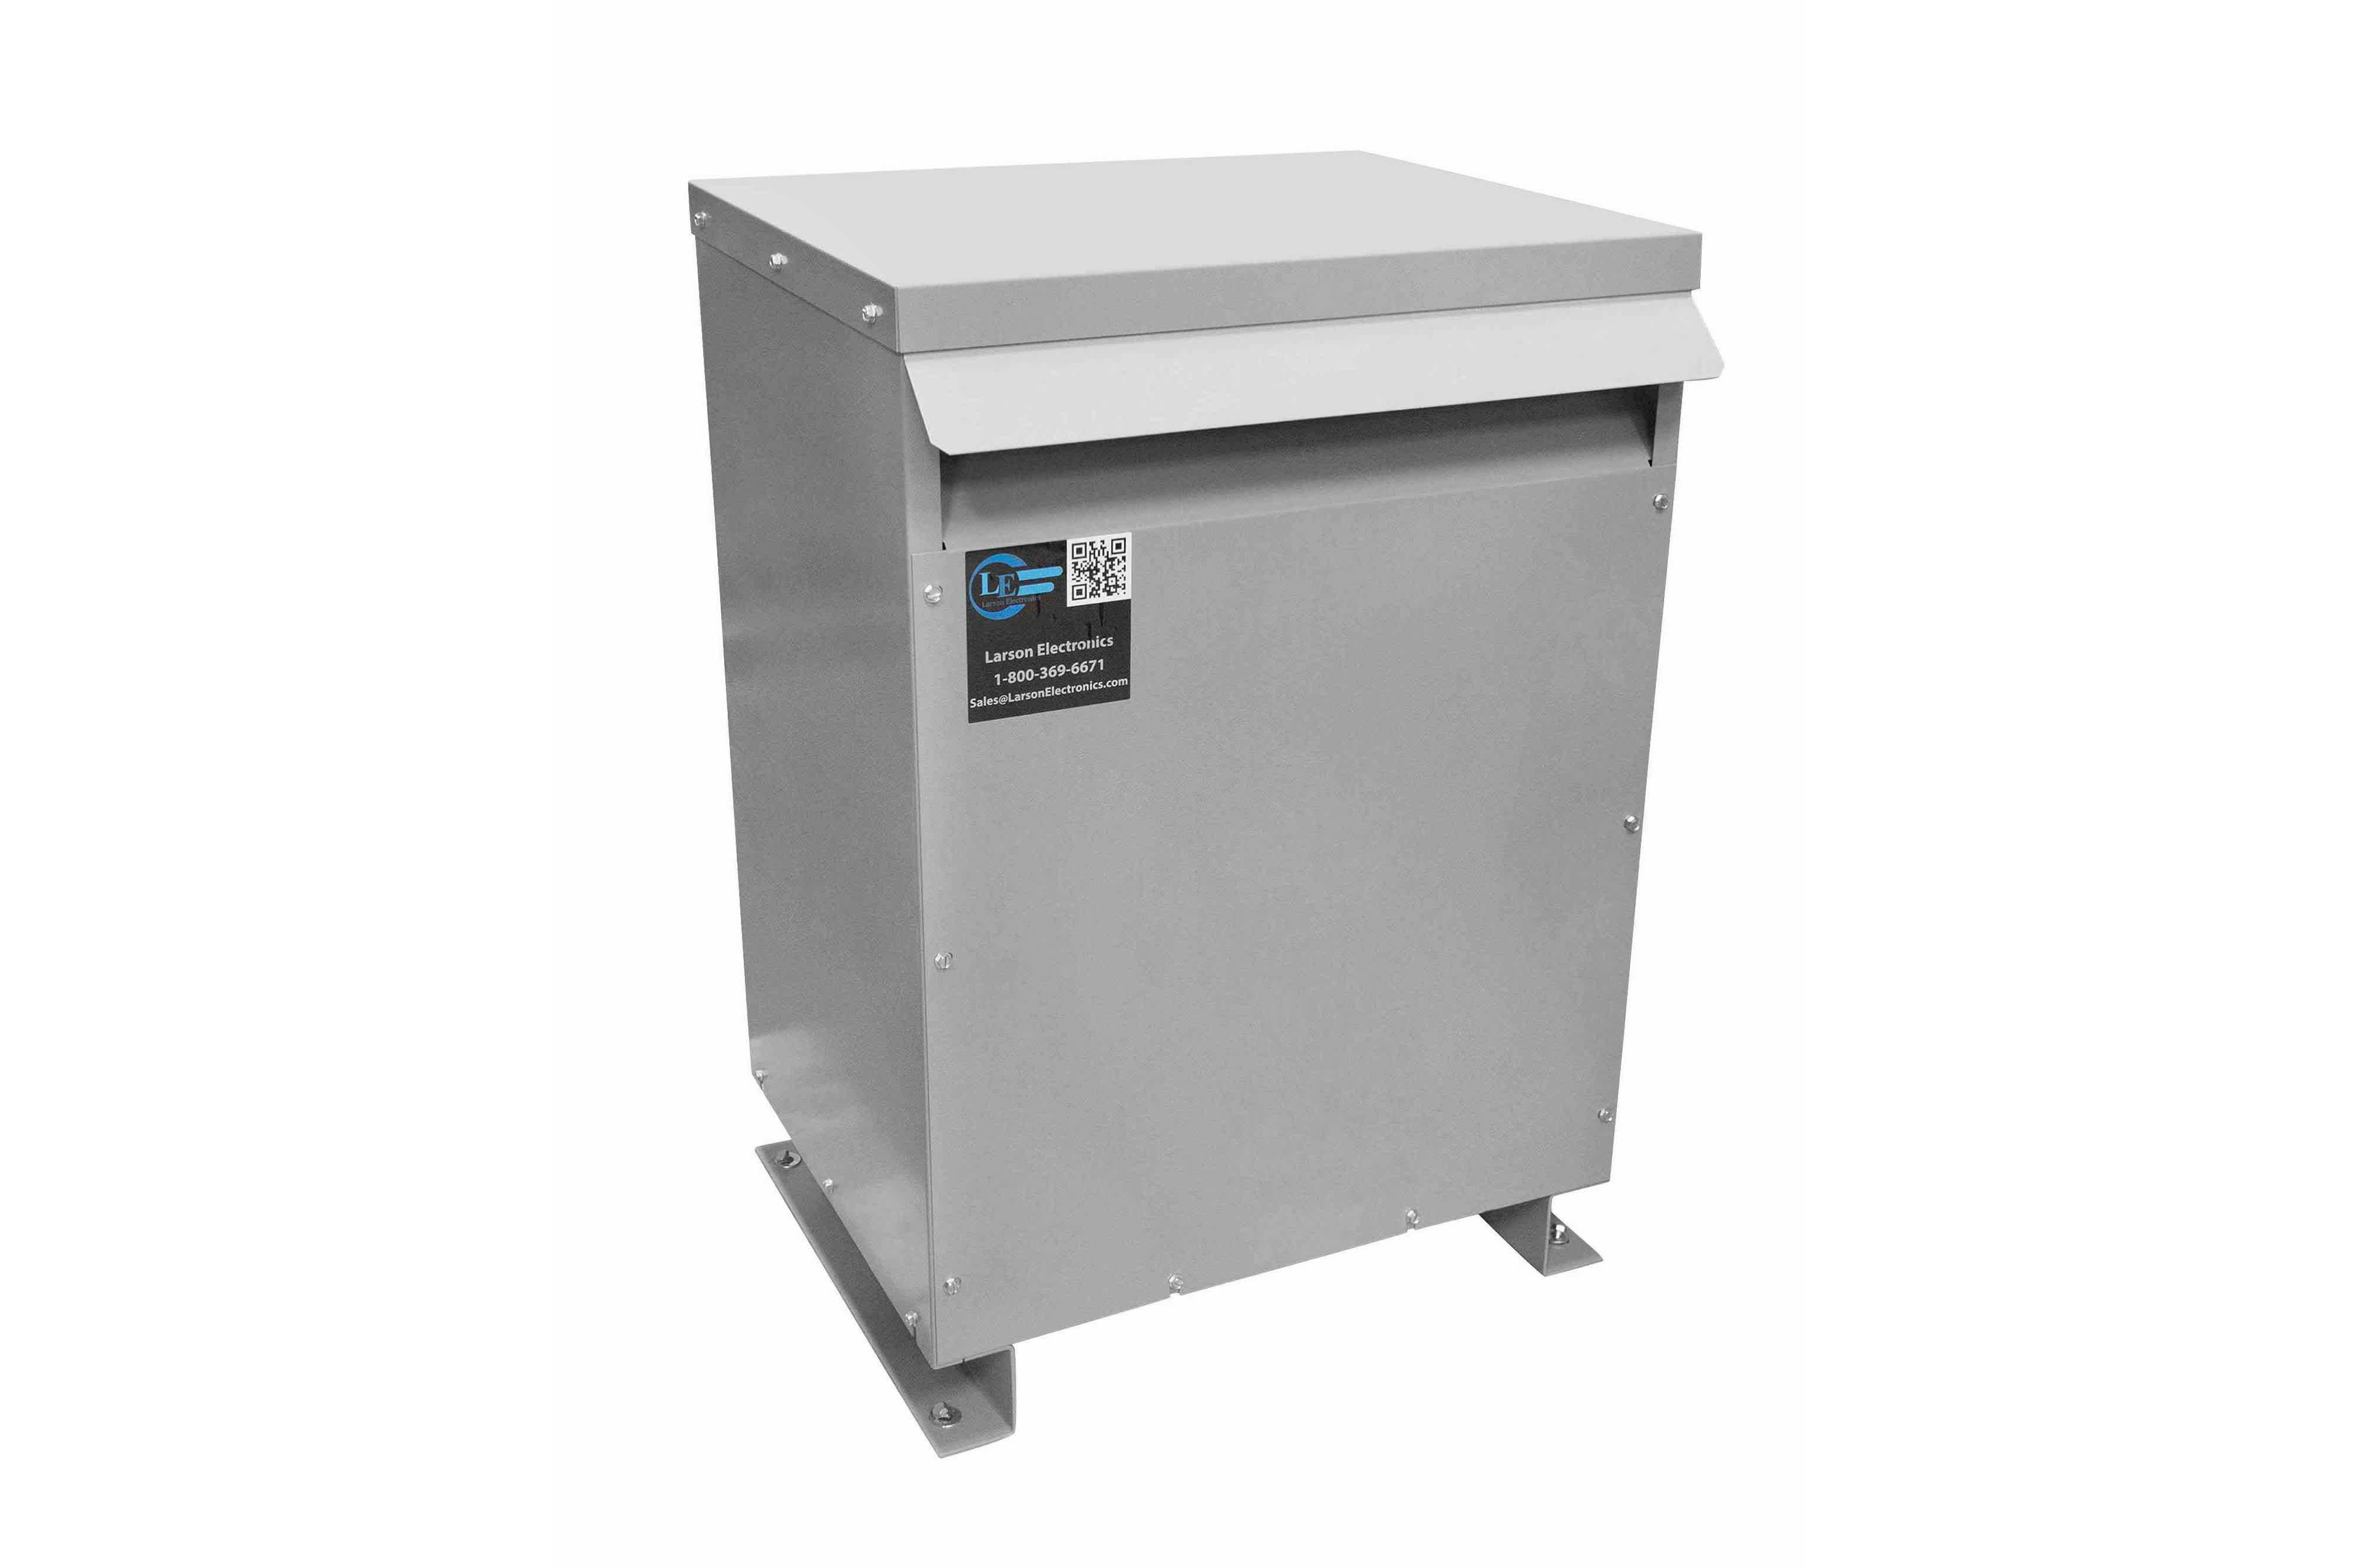 45 kVA 3PH Isolation Transformer, 600V Wye Primary, 240V Delta Secondary, N3R, Ventilated, 60 Hz